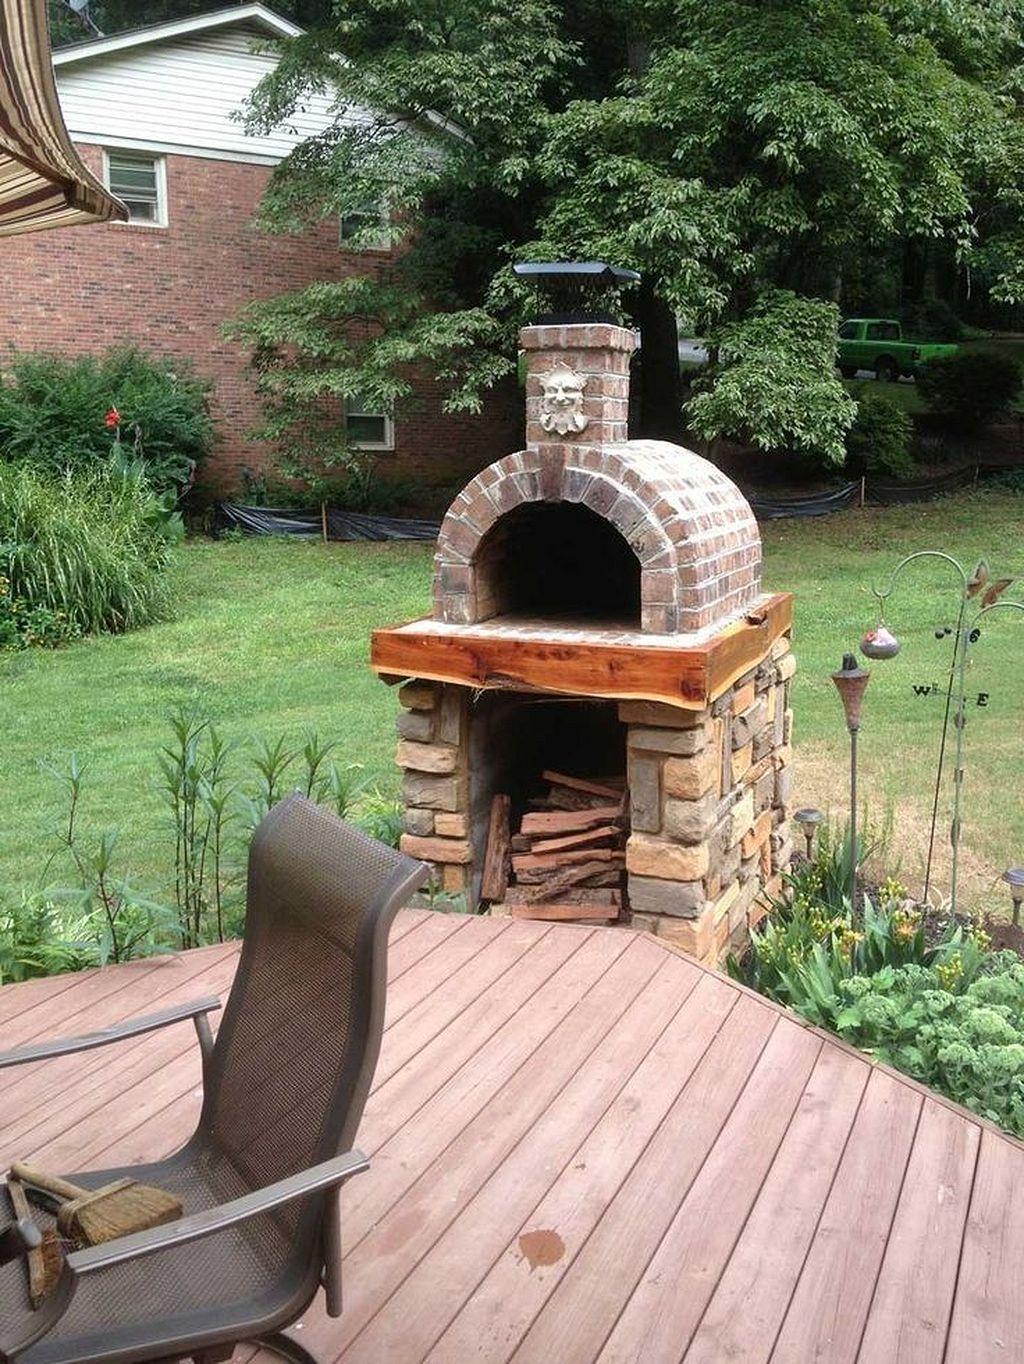 How To Make Yourself Backyard Brick Grill Diy Pizza Oven Brick Pizza Oven Brick Oven Outdoor